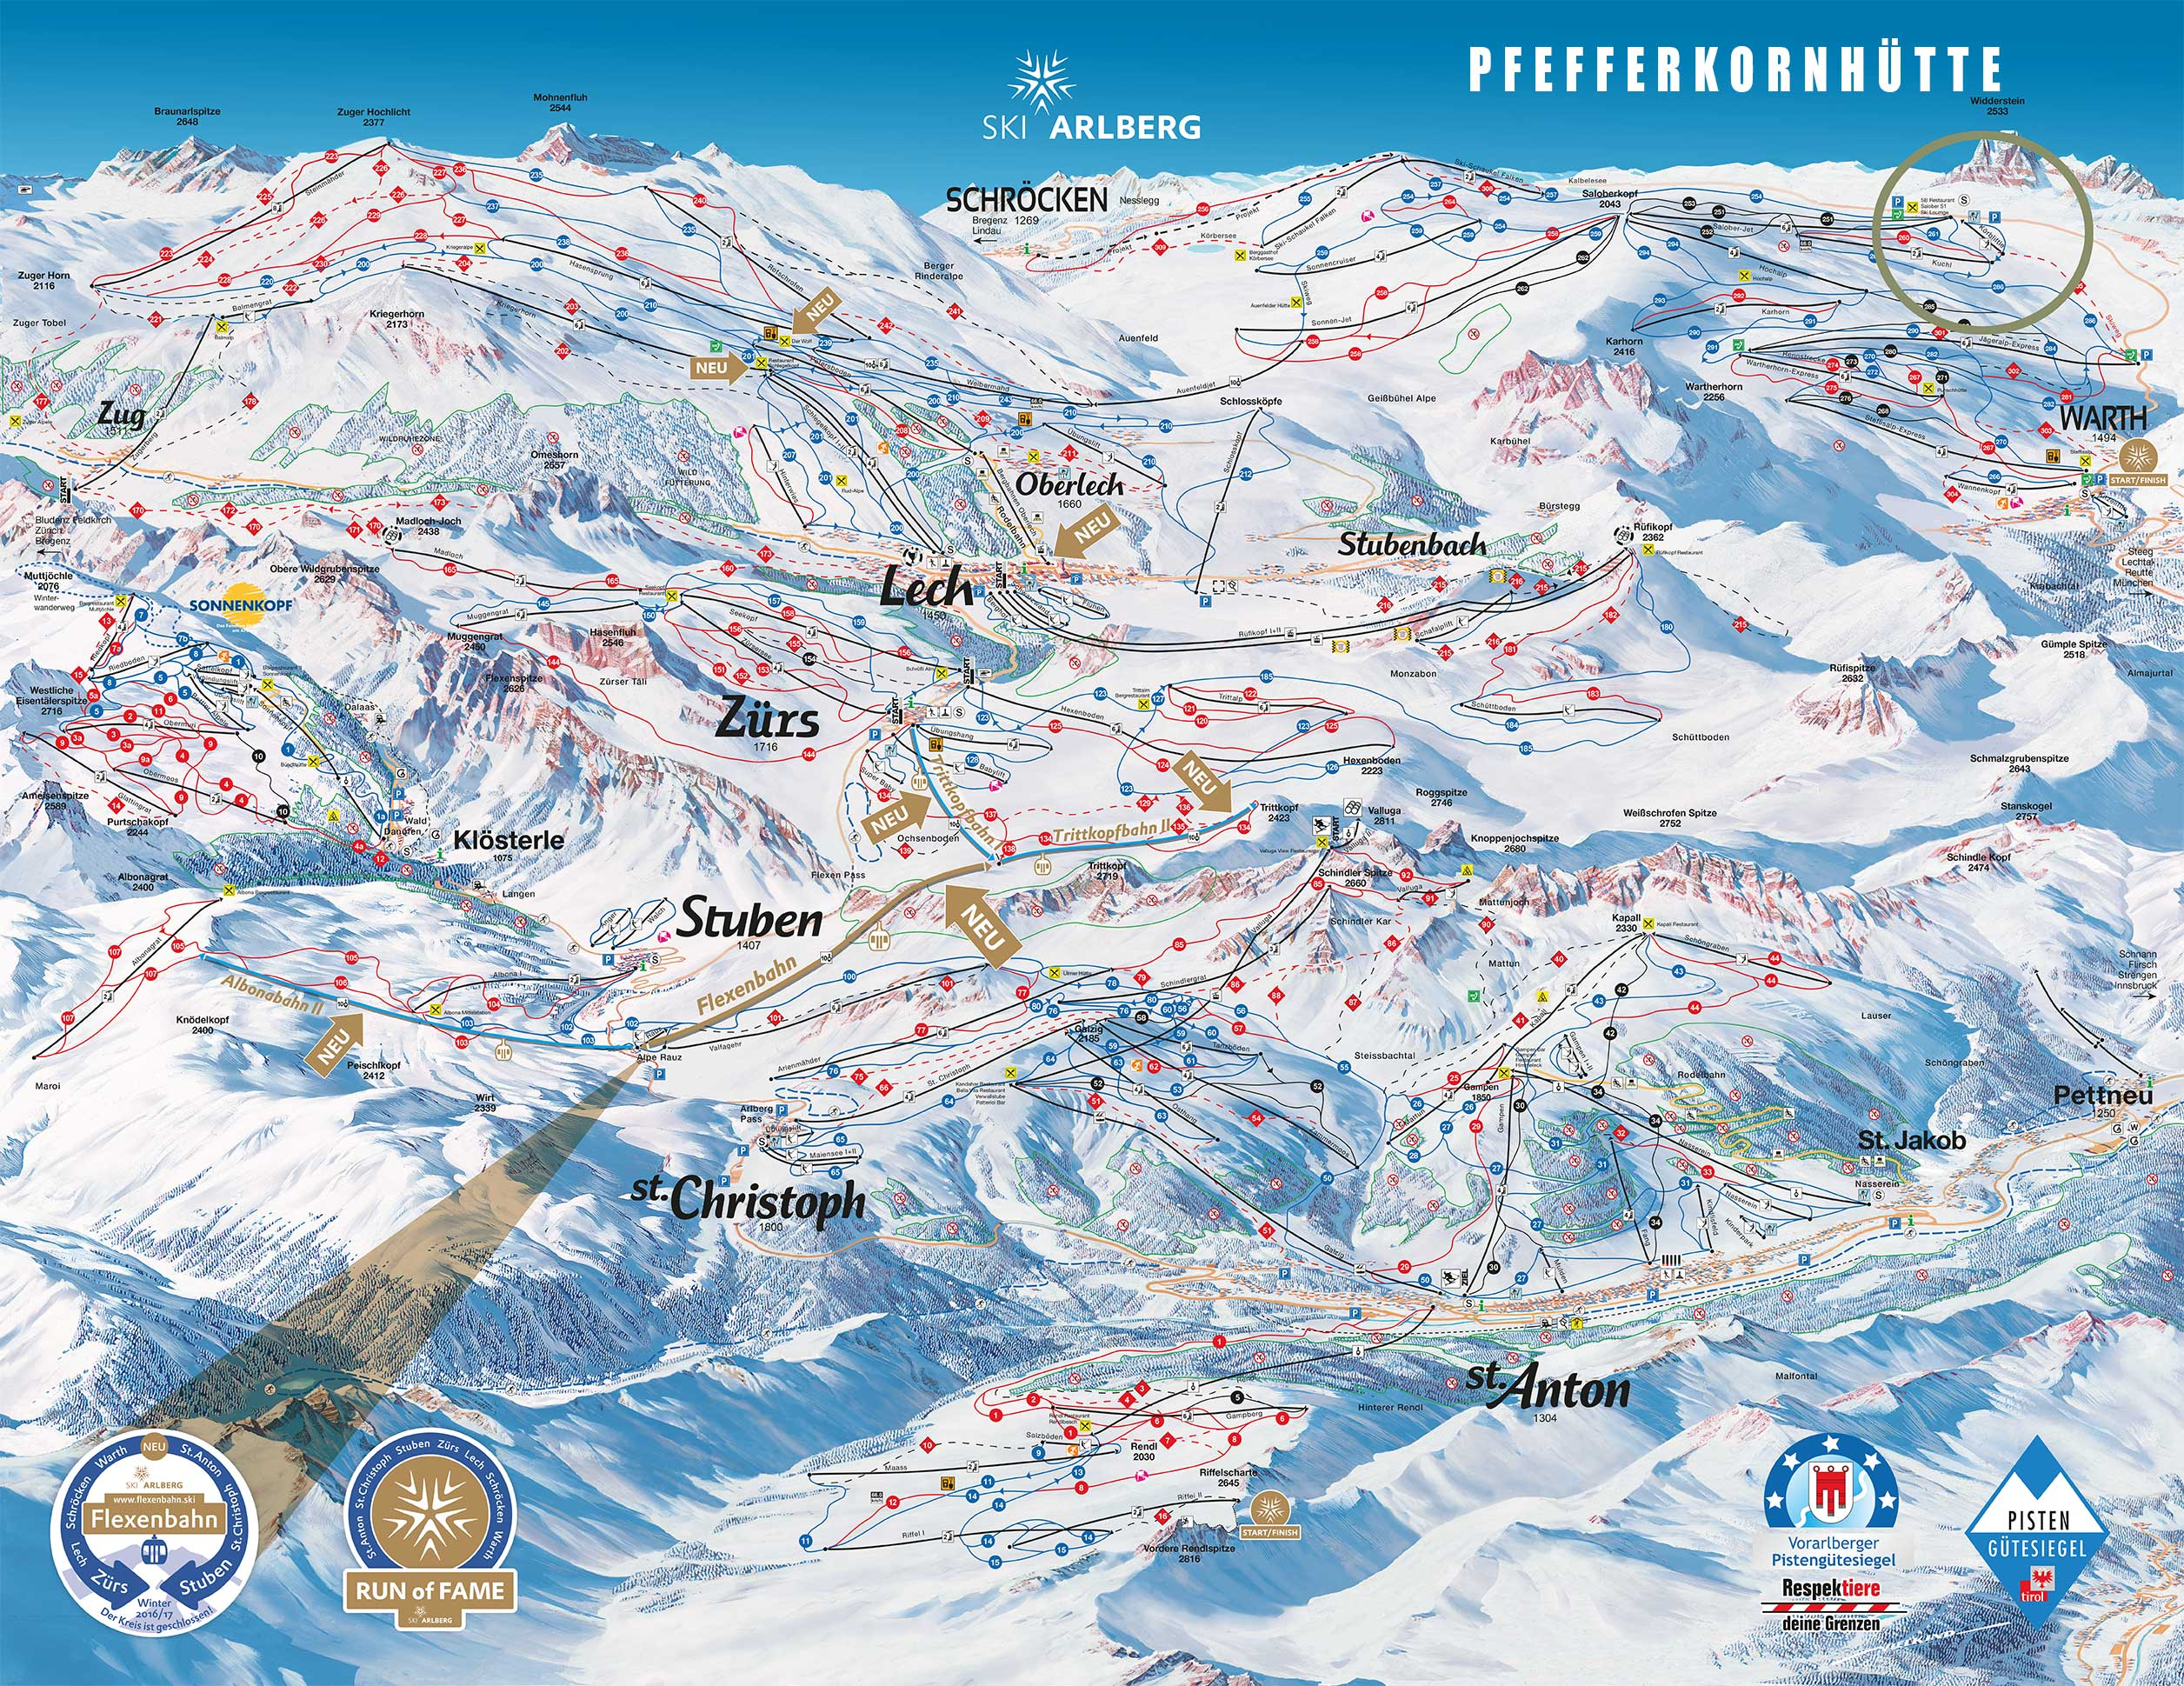 Panokarte_Ski_Arlberg_16_17